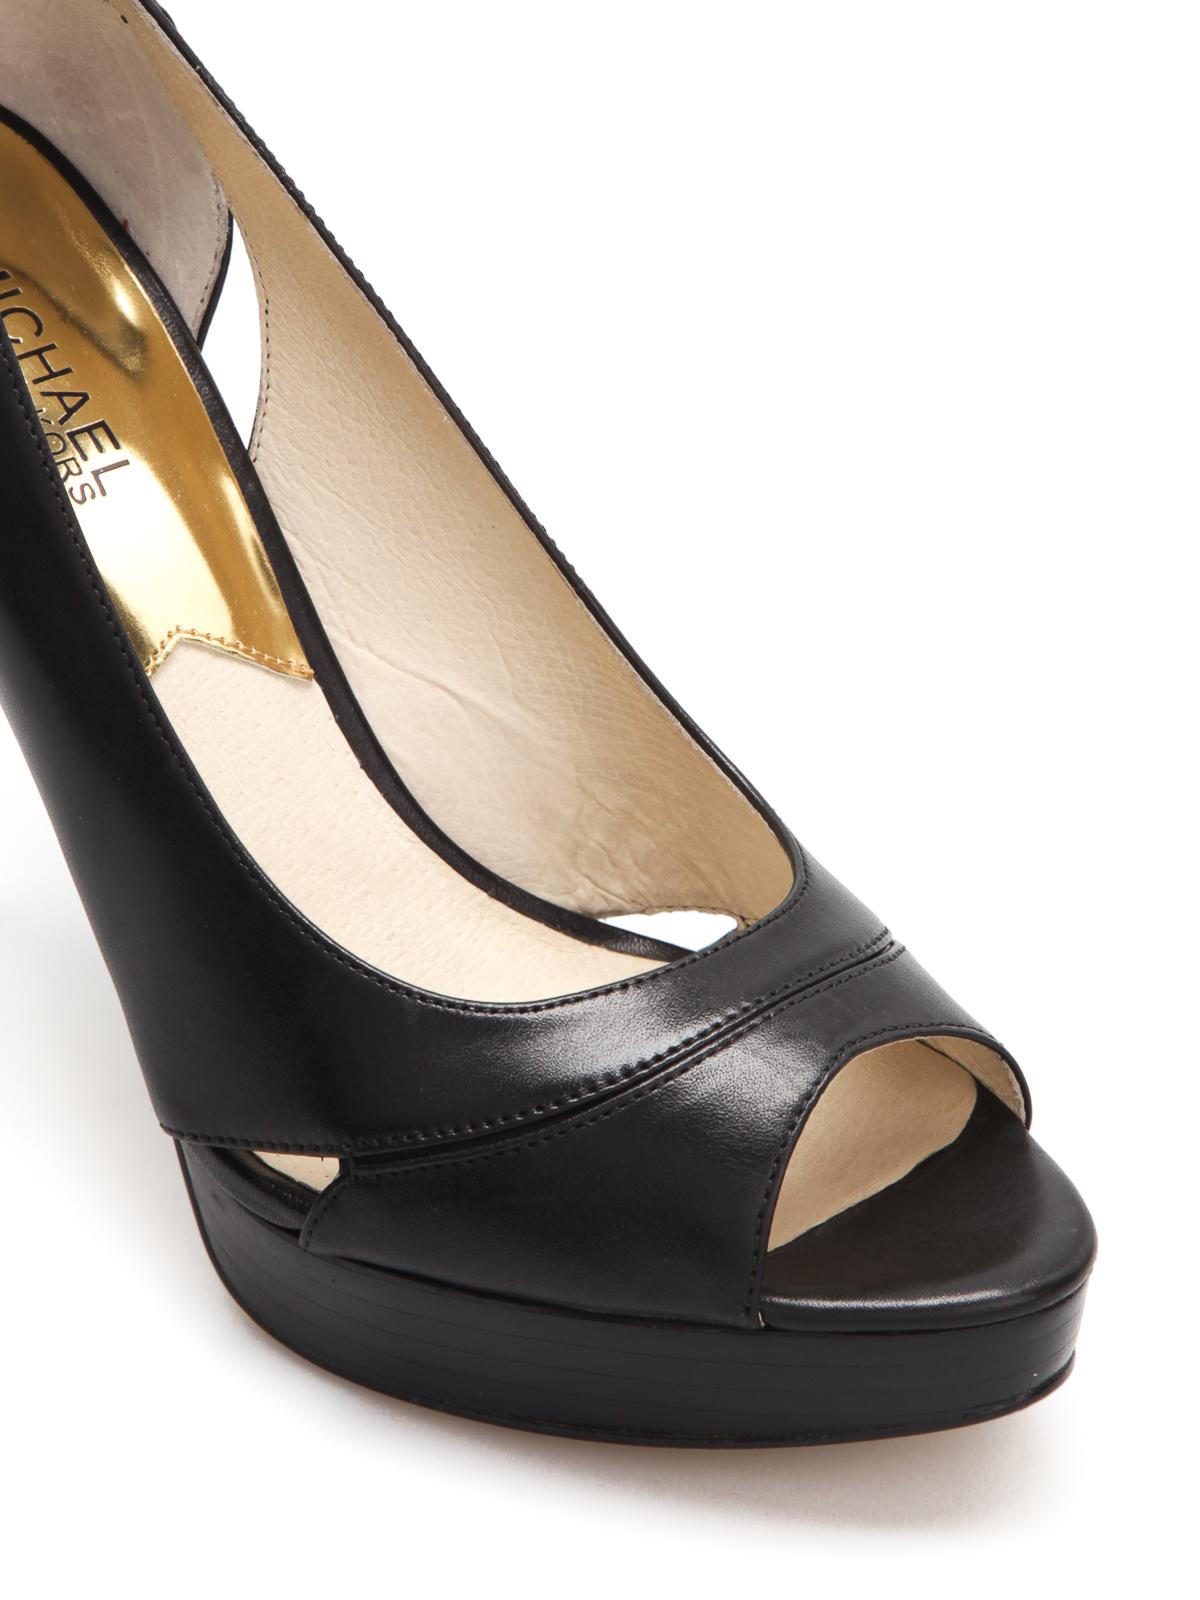 3d8d4637663f MICHAEL KORS buy online Hamilton open toe. MICHAEL KORS  court shoes -  Hamilton open toe